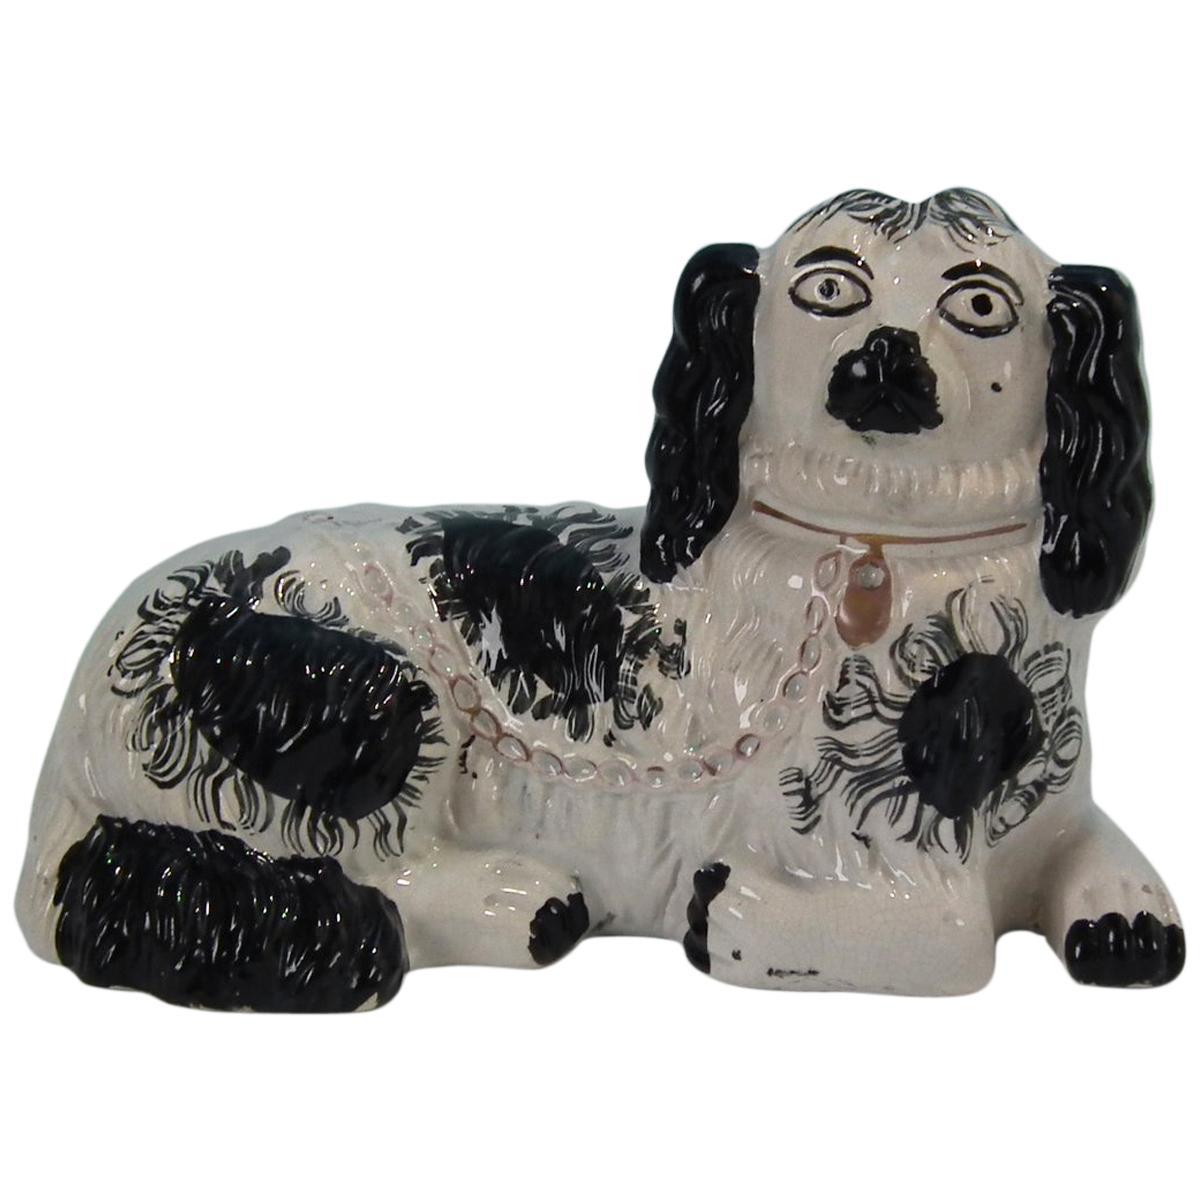 Large Staffordshire Recumbent Black and White Spaniel